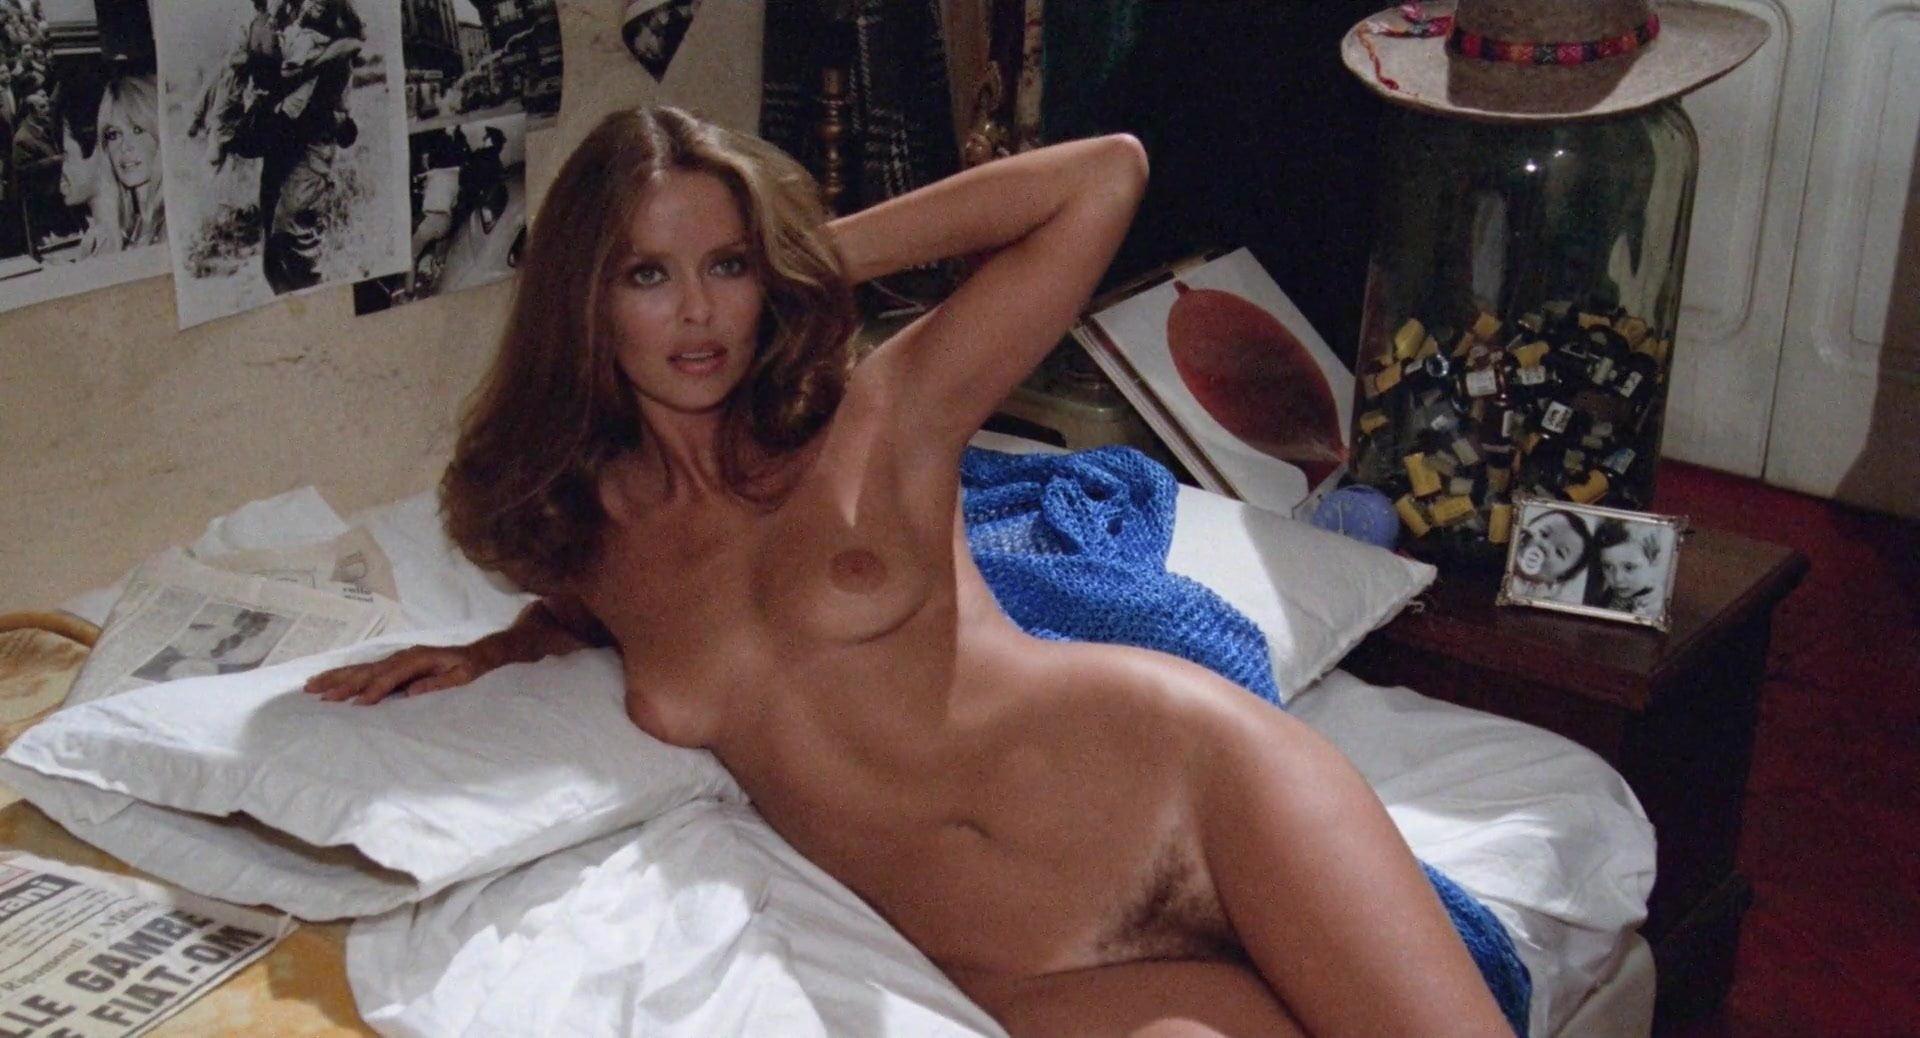 Barbara Bach Ecco Noi Per Esempio Full Frontal Nude Ru-4110